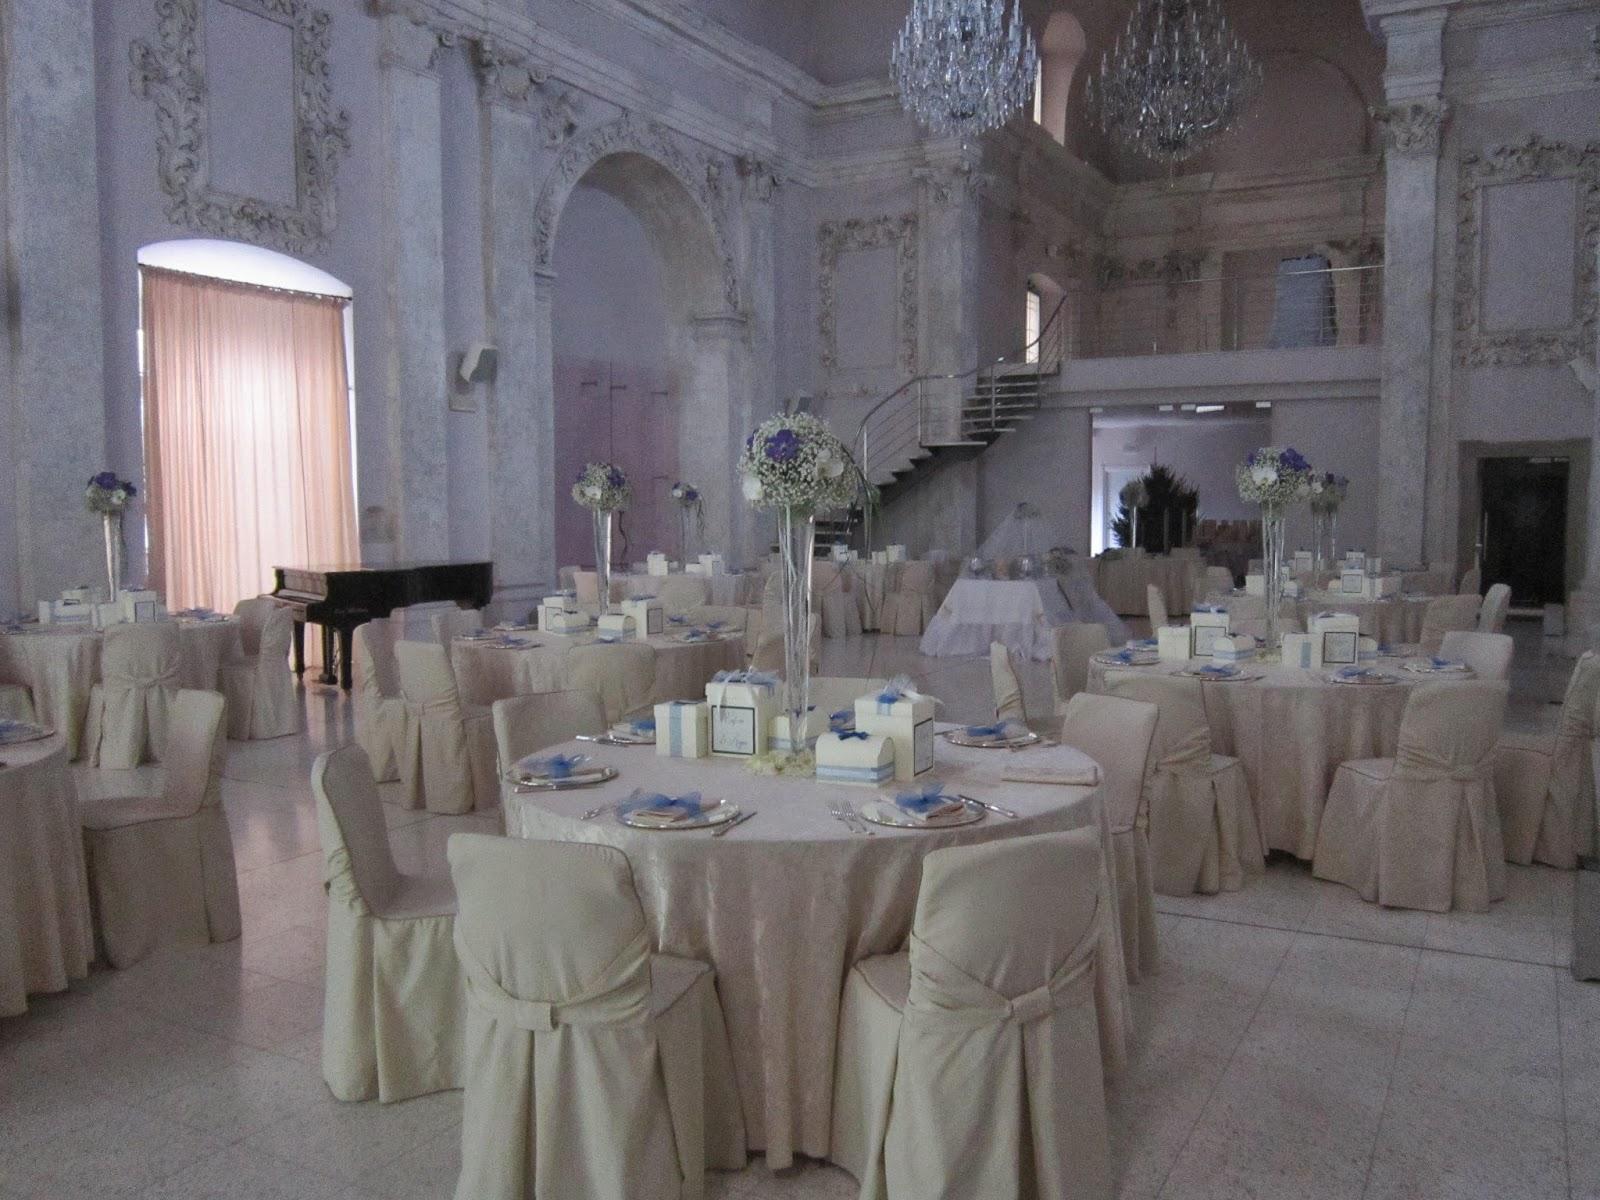 Matrimonio D Inverno Location Toscana : Matrimonio invernale sposarsi in inverno: sposarsi dinverno in un